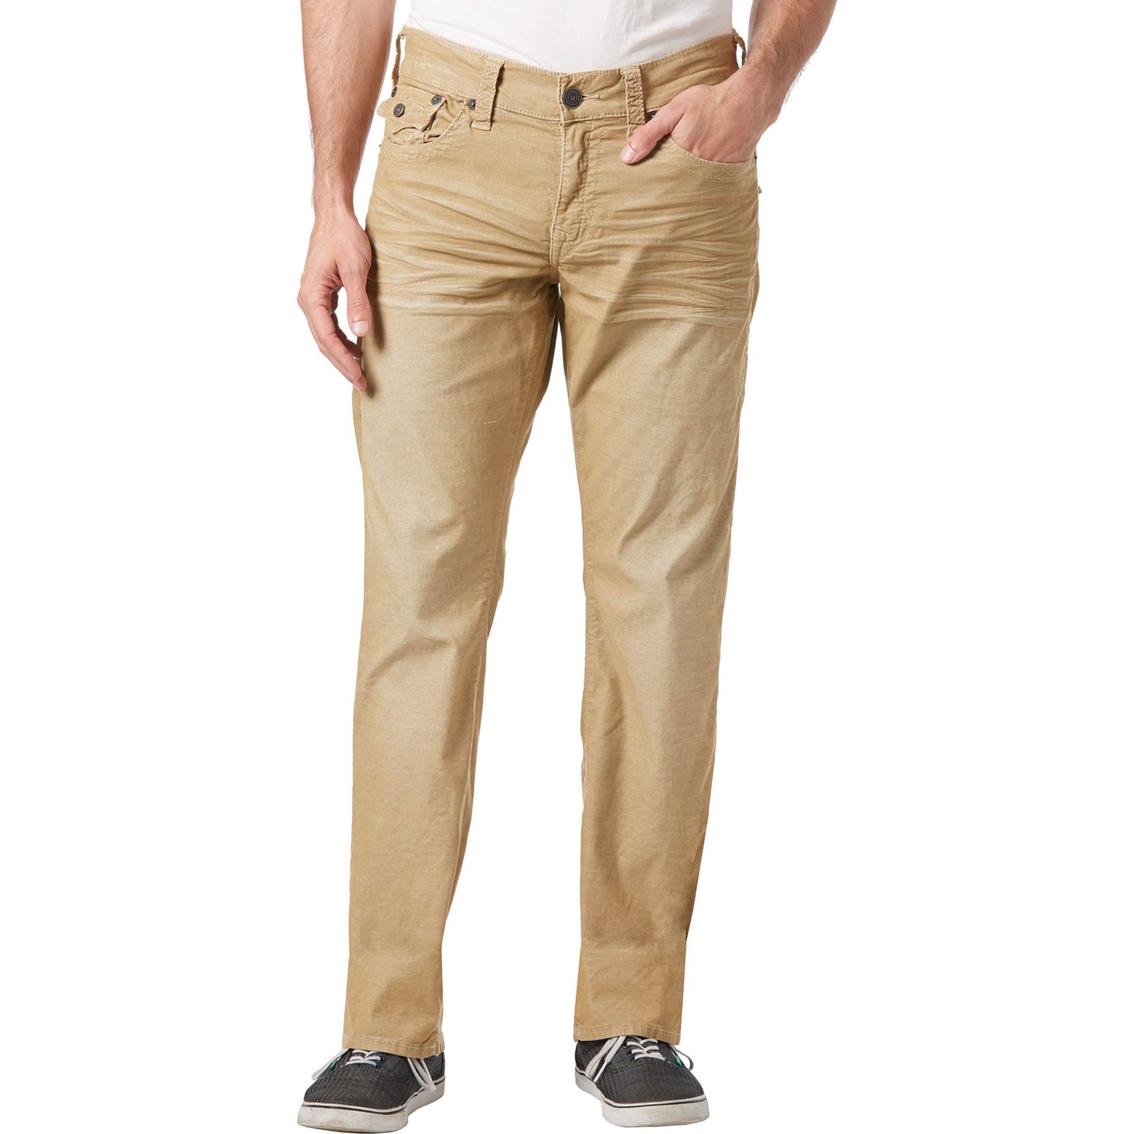 142e0fb8a True Religion Ricky Straight Leg Corduroy Pants   Jeans   Apparel ...